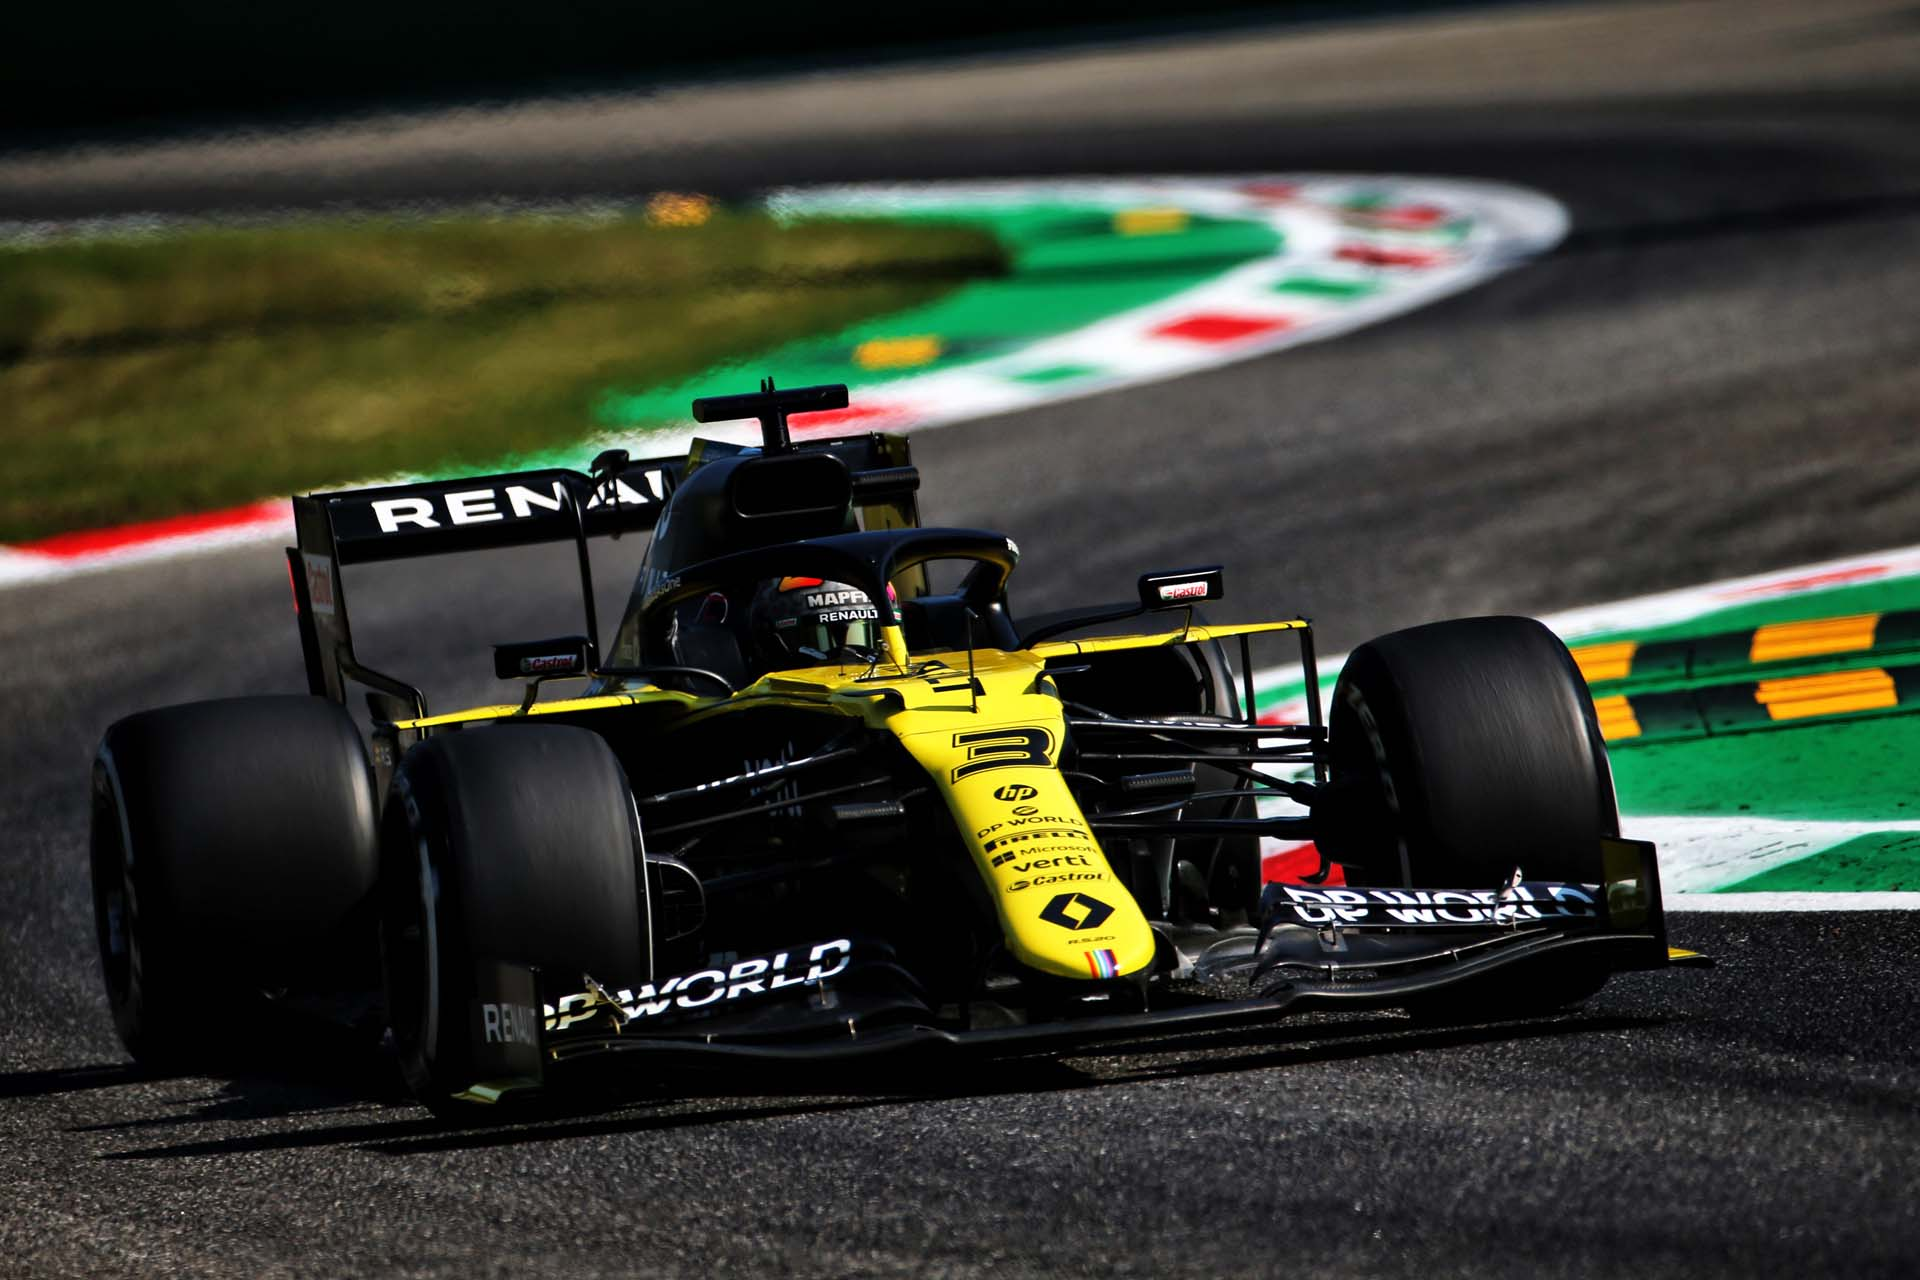 Motor Racing - Formula One World Championship - Italian Grand Prix - Practice Day - Monza, Italy